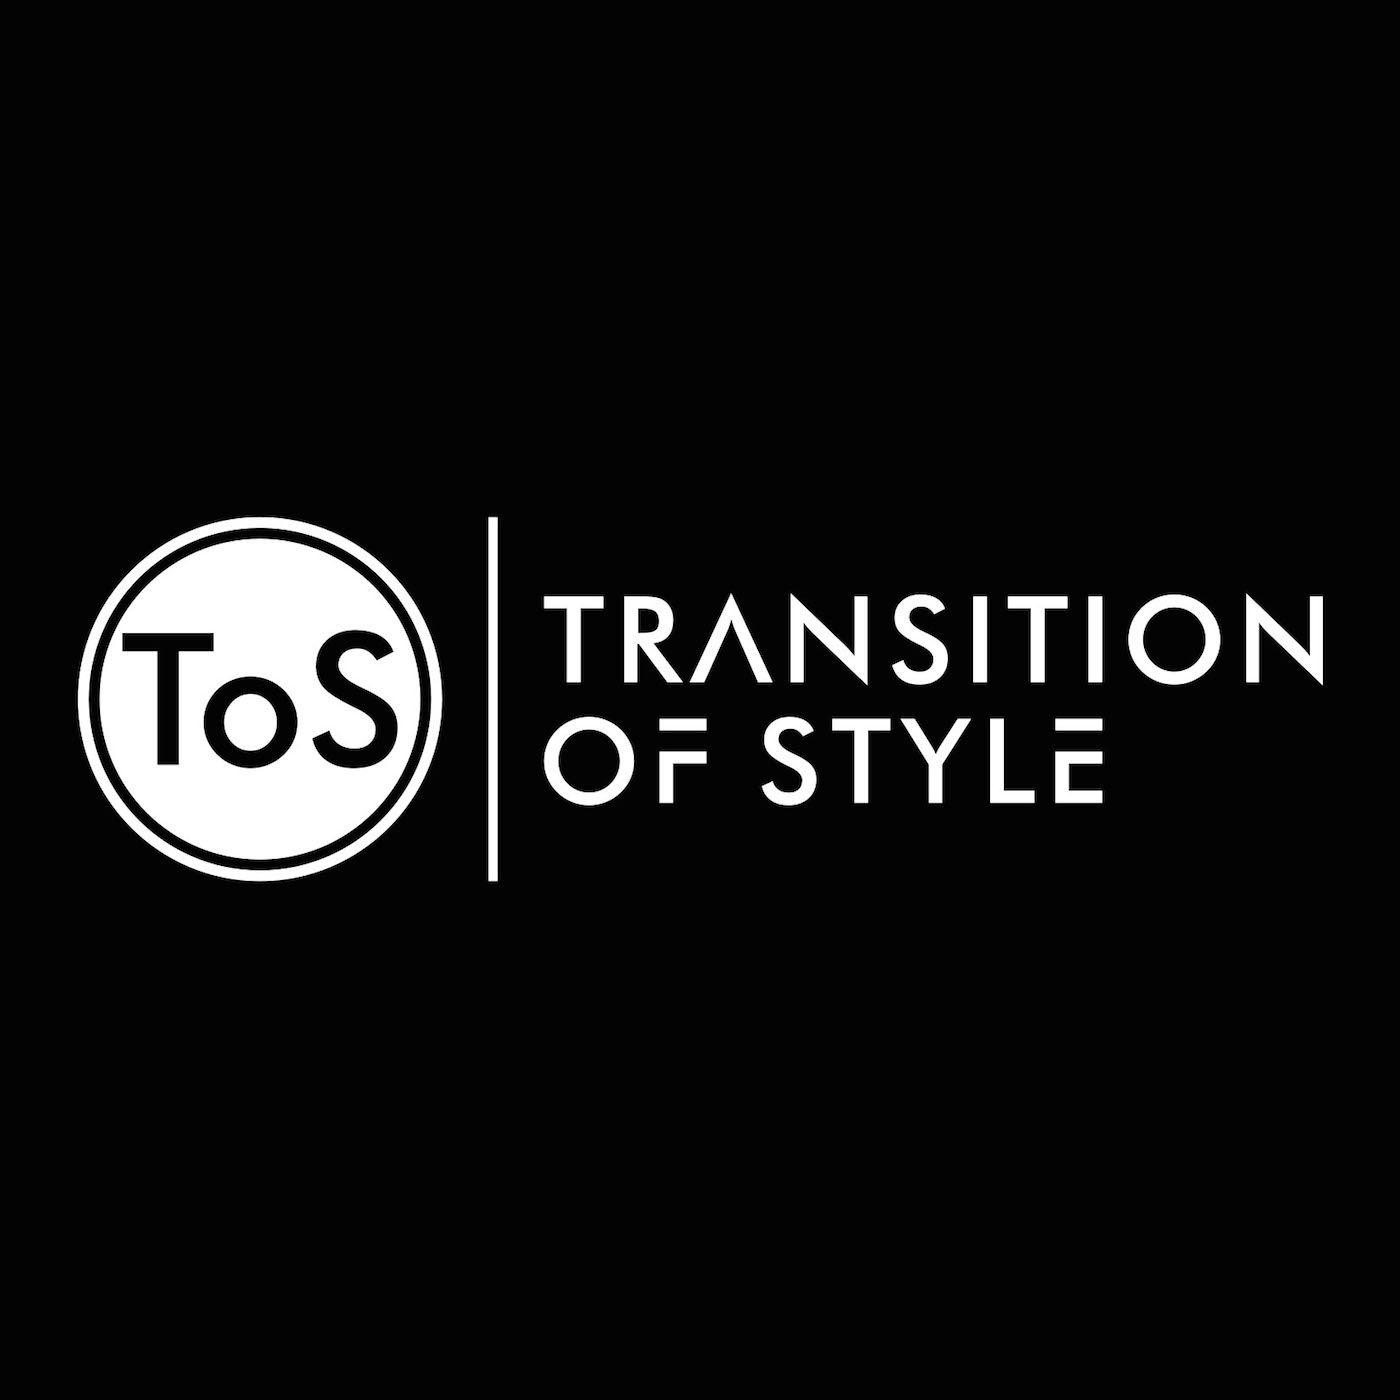 Transition of Style logo14.jpg